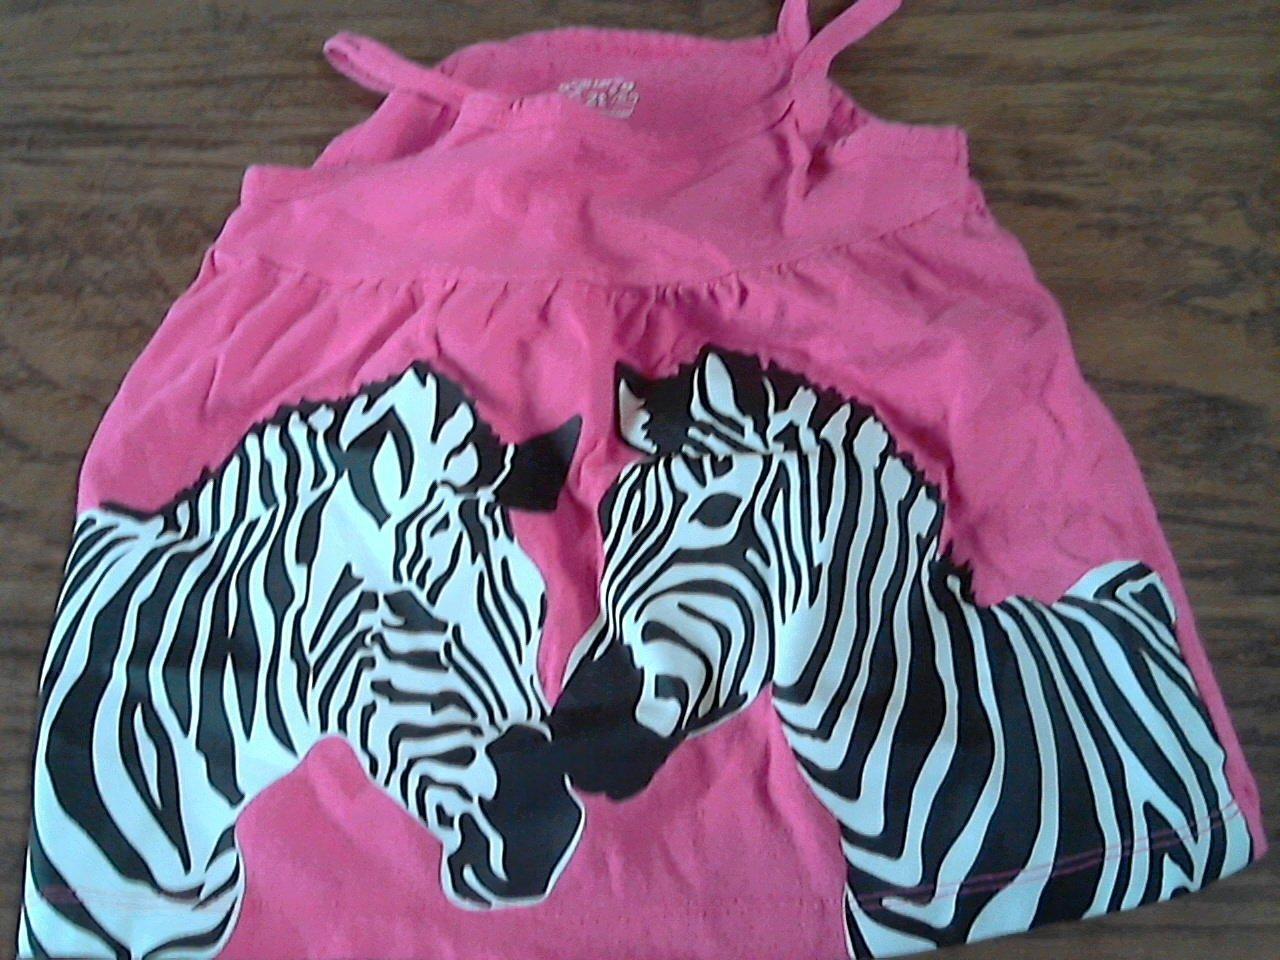 Carter's todder girl's hot pink string top 2T